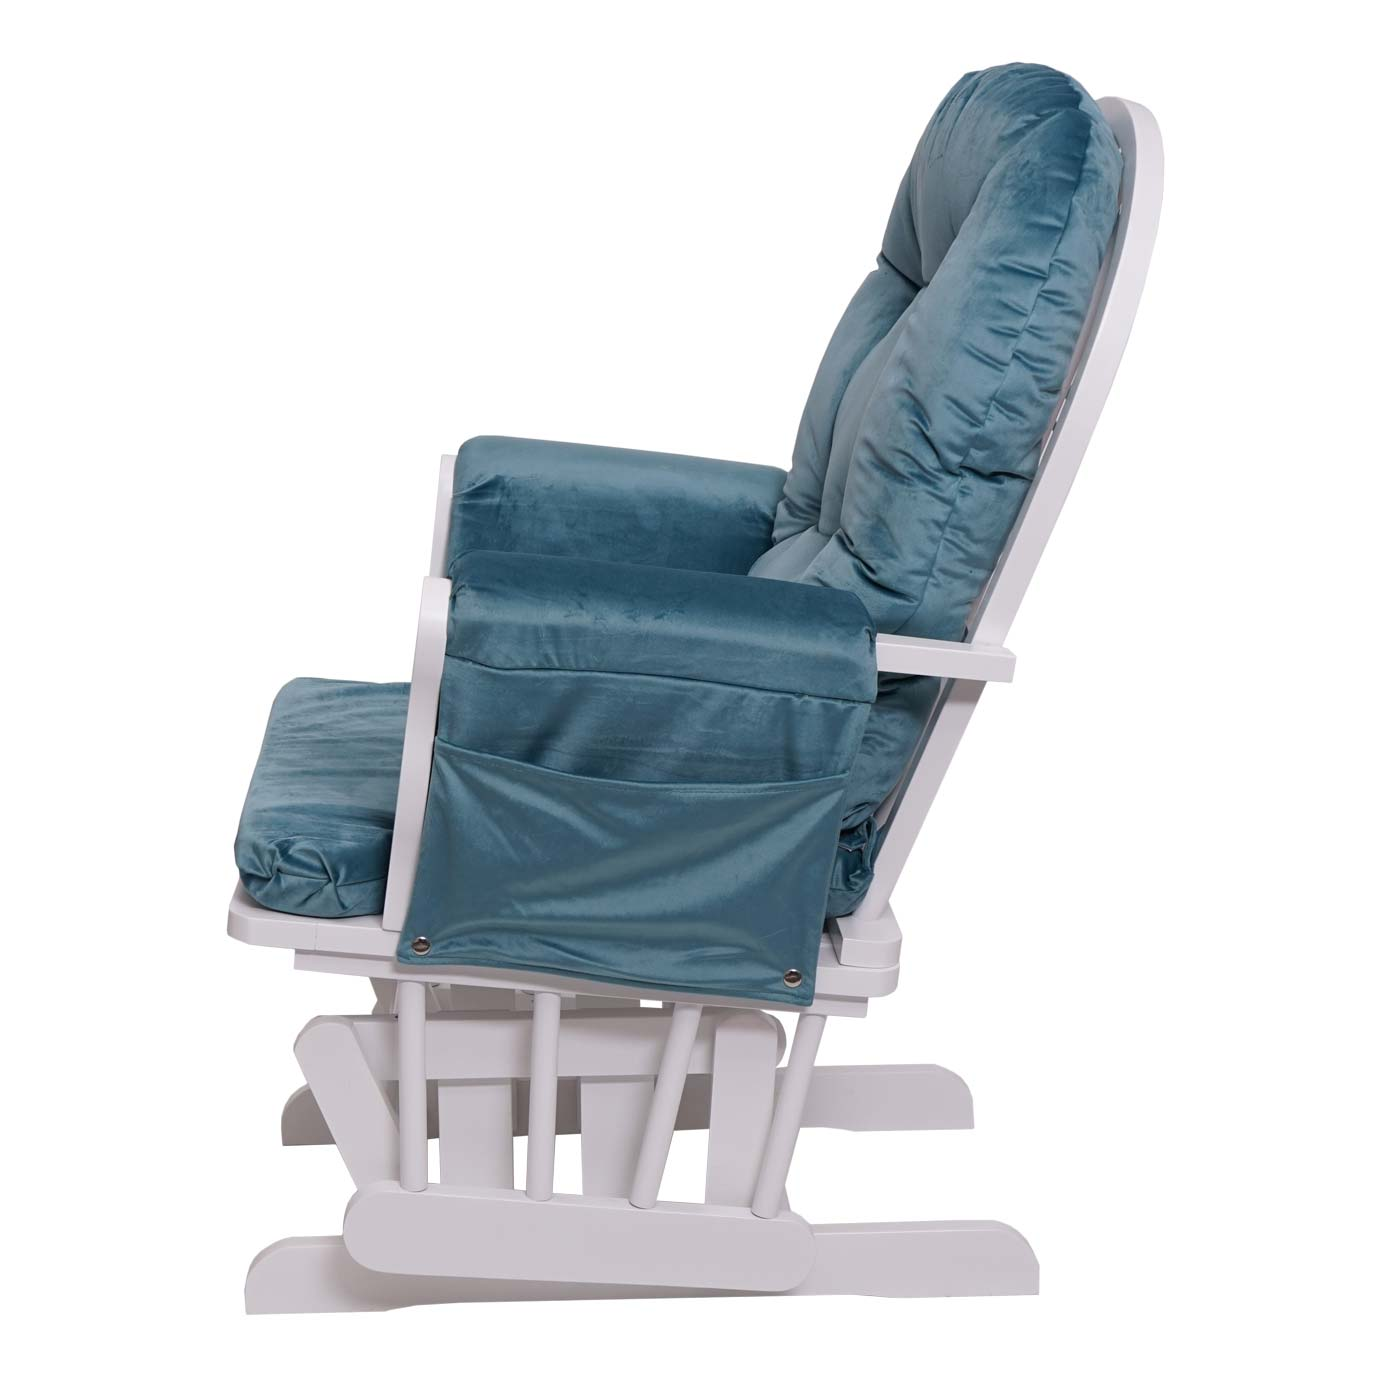 Relaxsessel HWC-C76 Seitenansicht Sessel